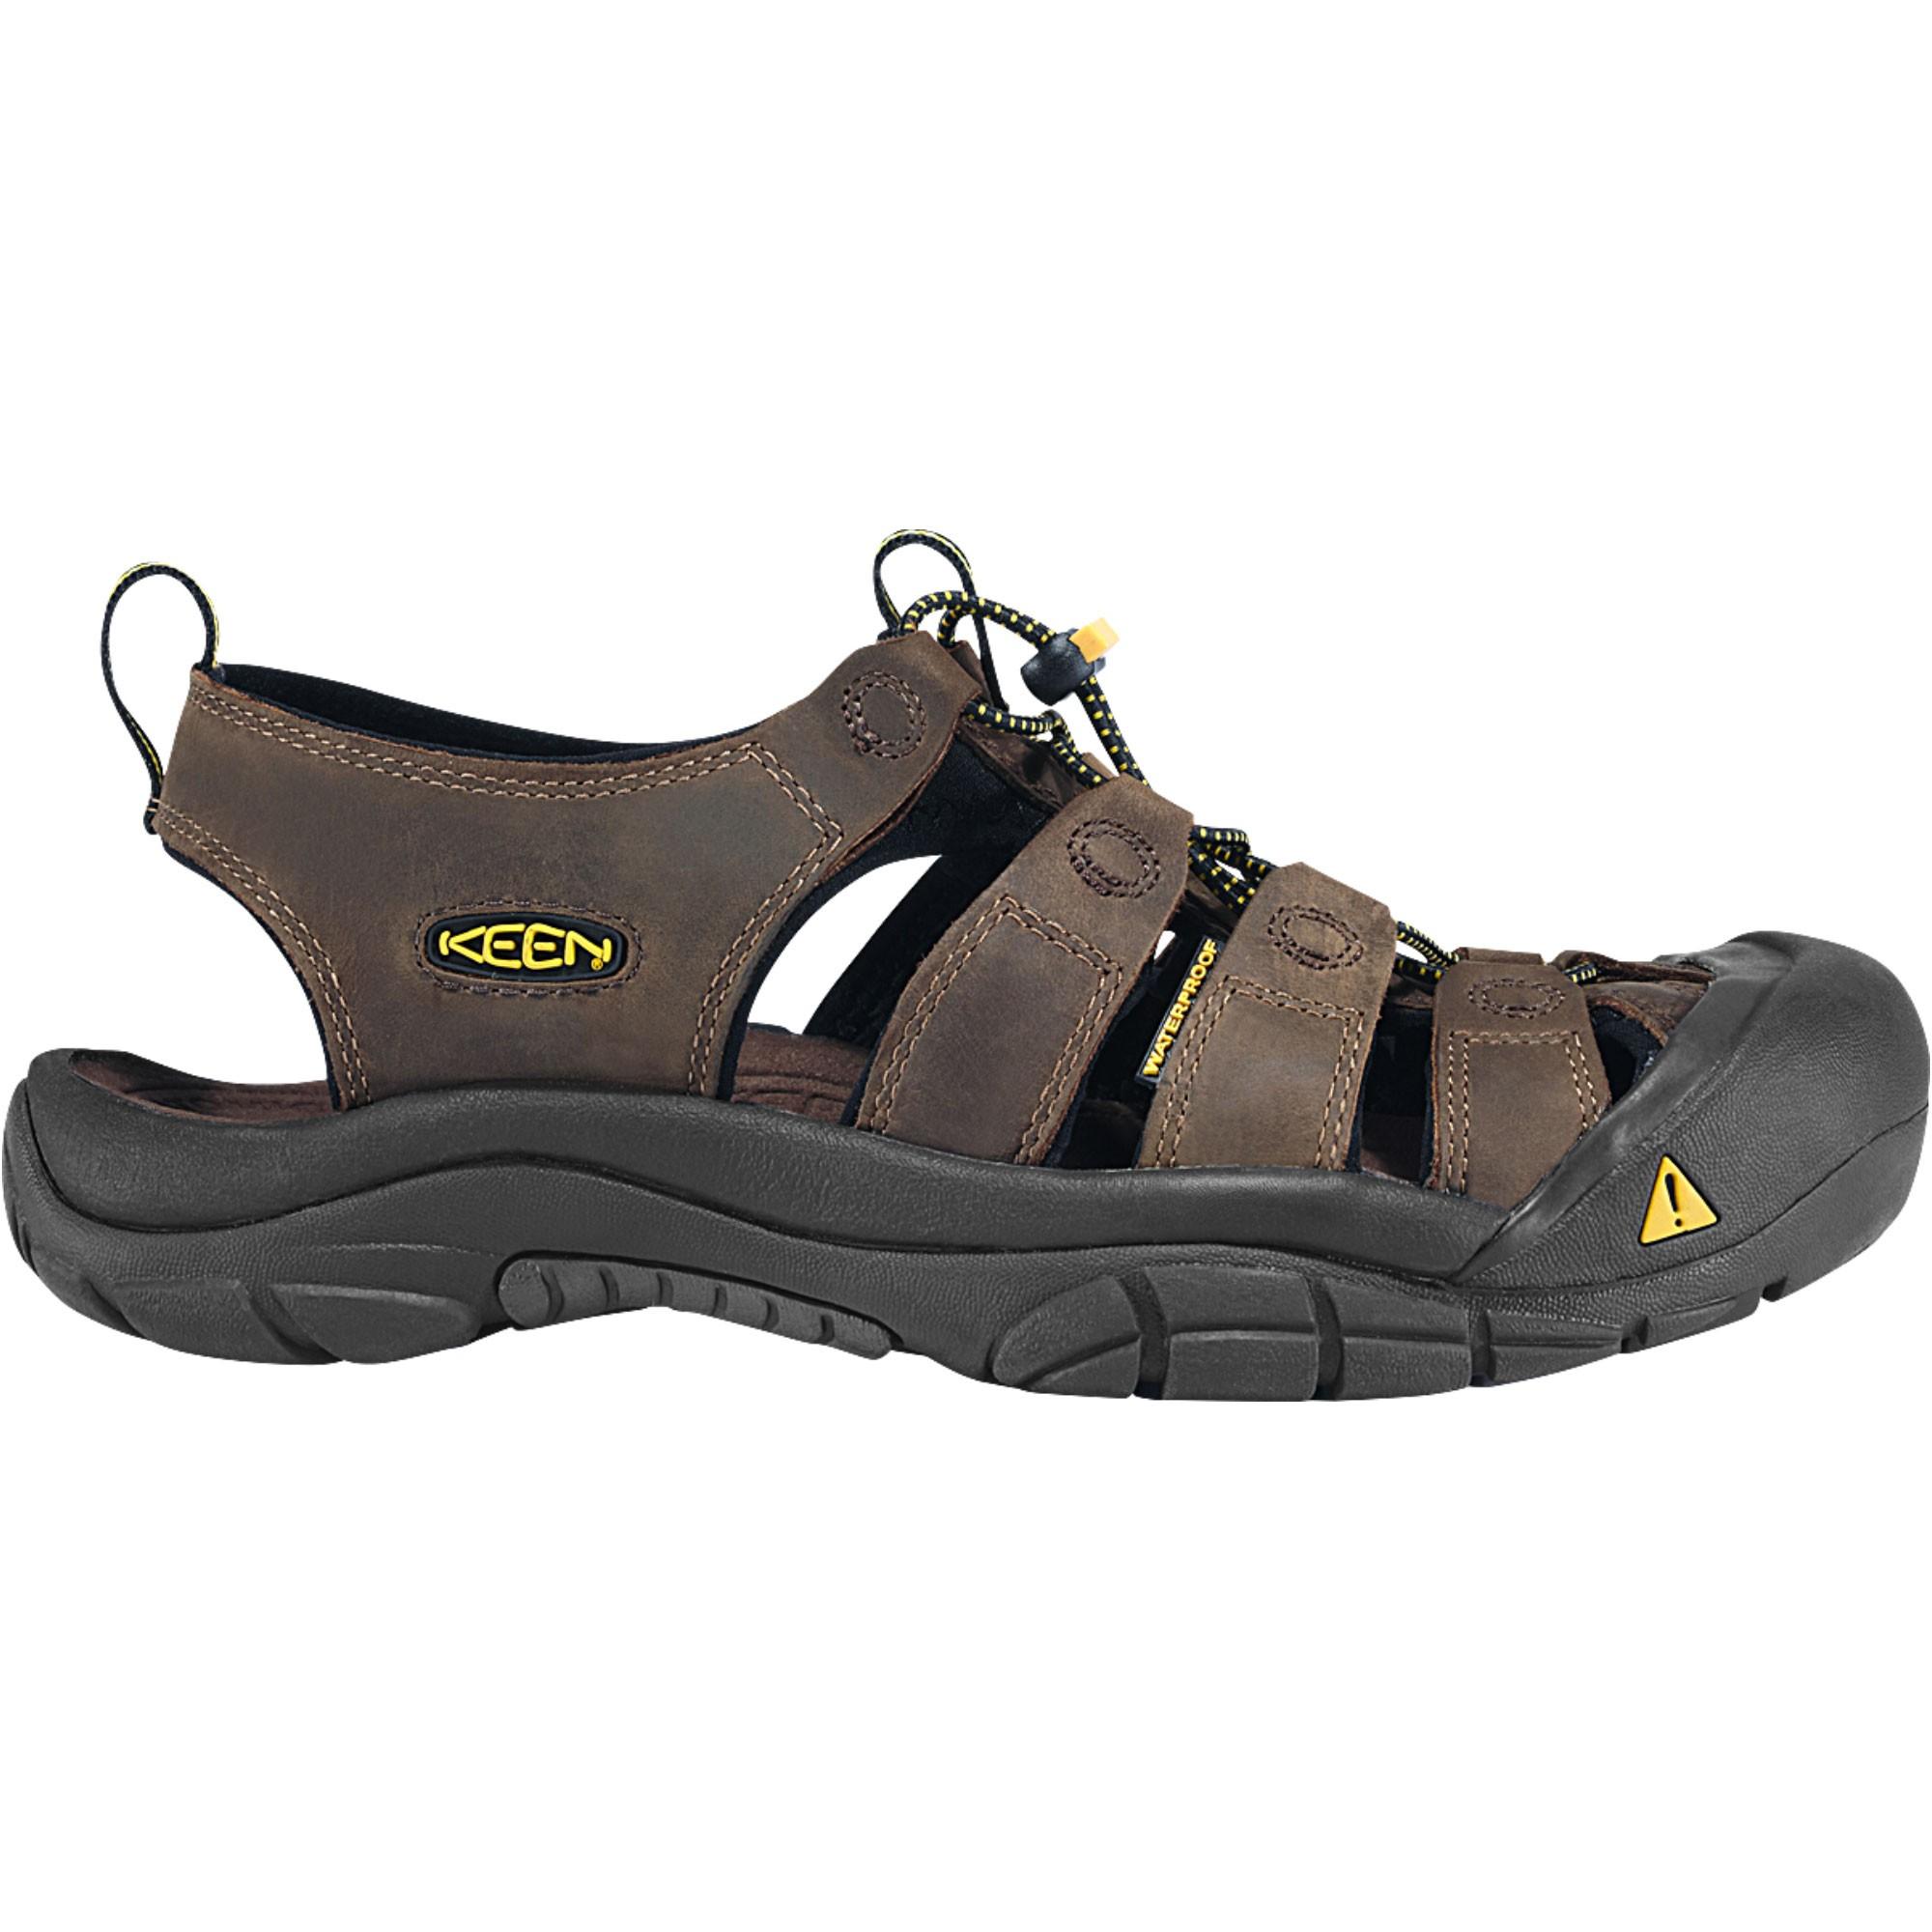 KEEN - Newport Sandals